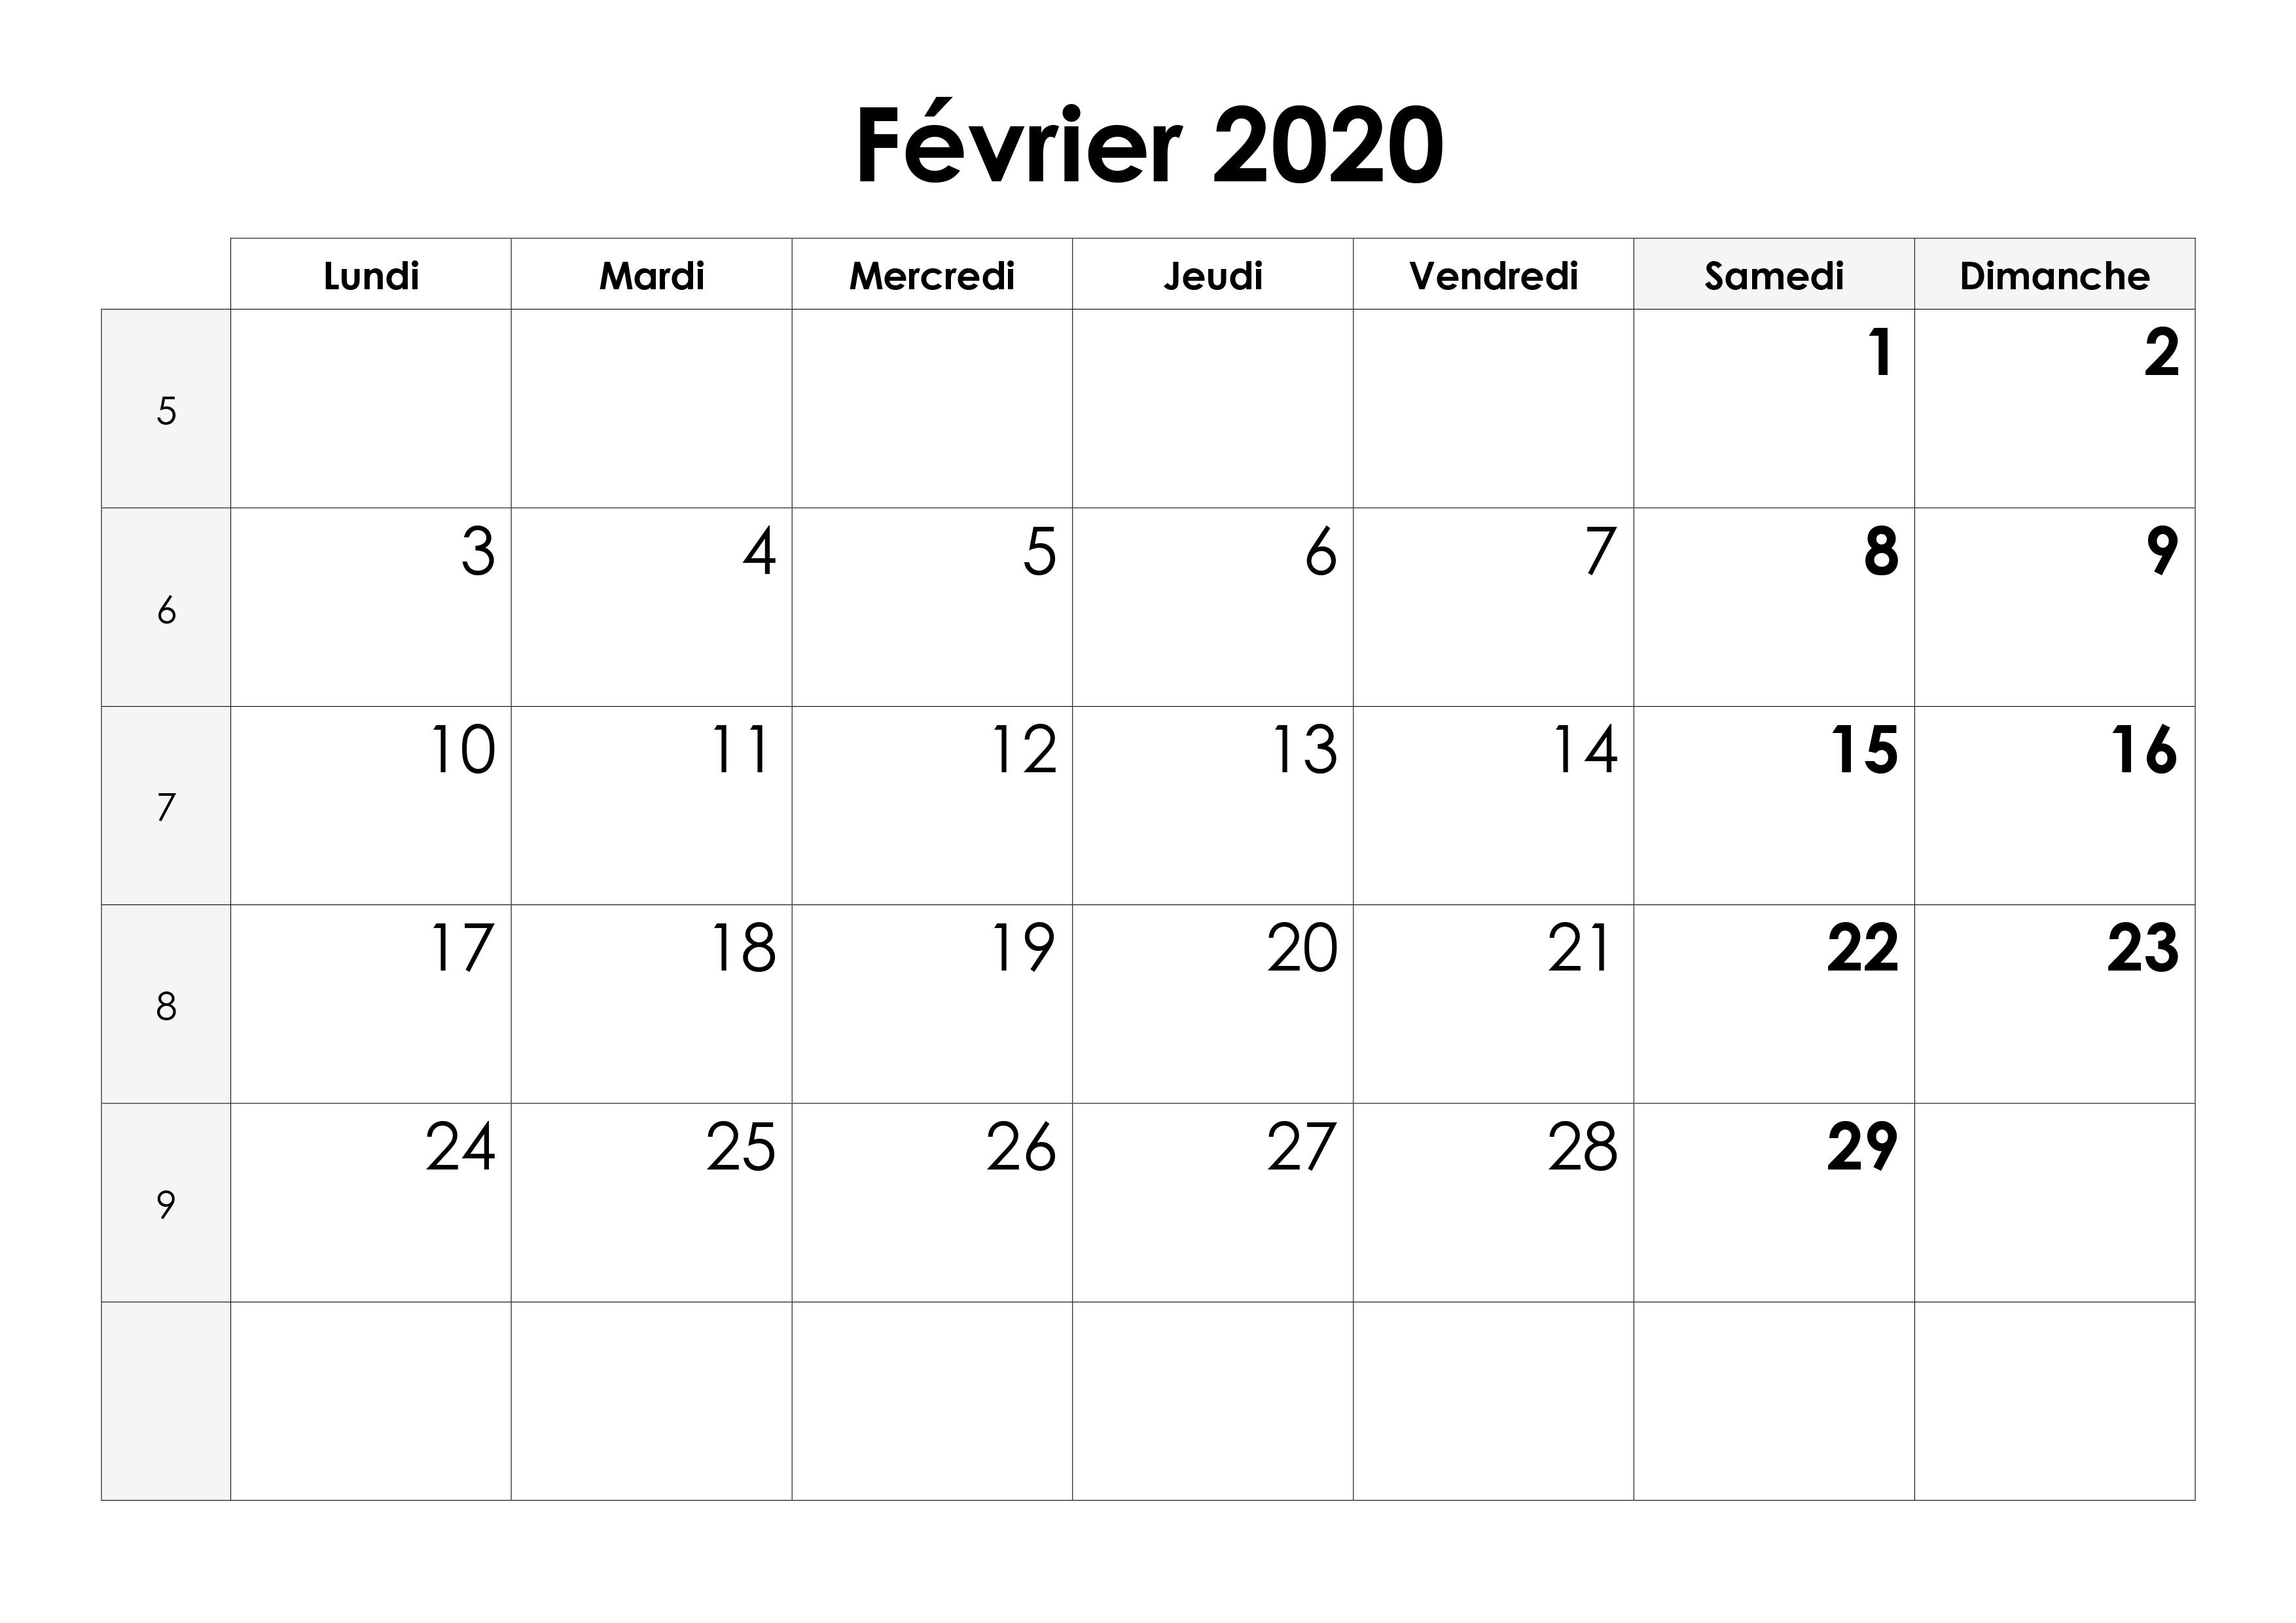 Calendrier Février 2020.Calendrier Fevrier 2020 Calendrier Su